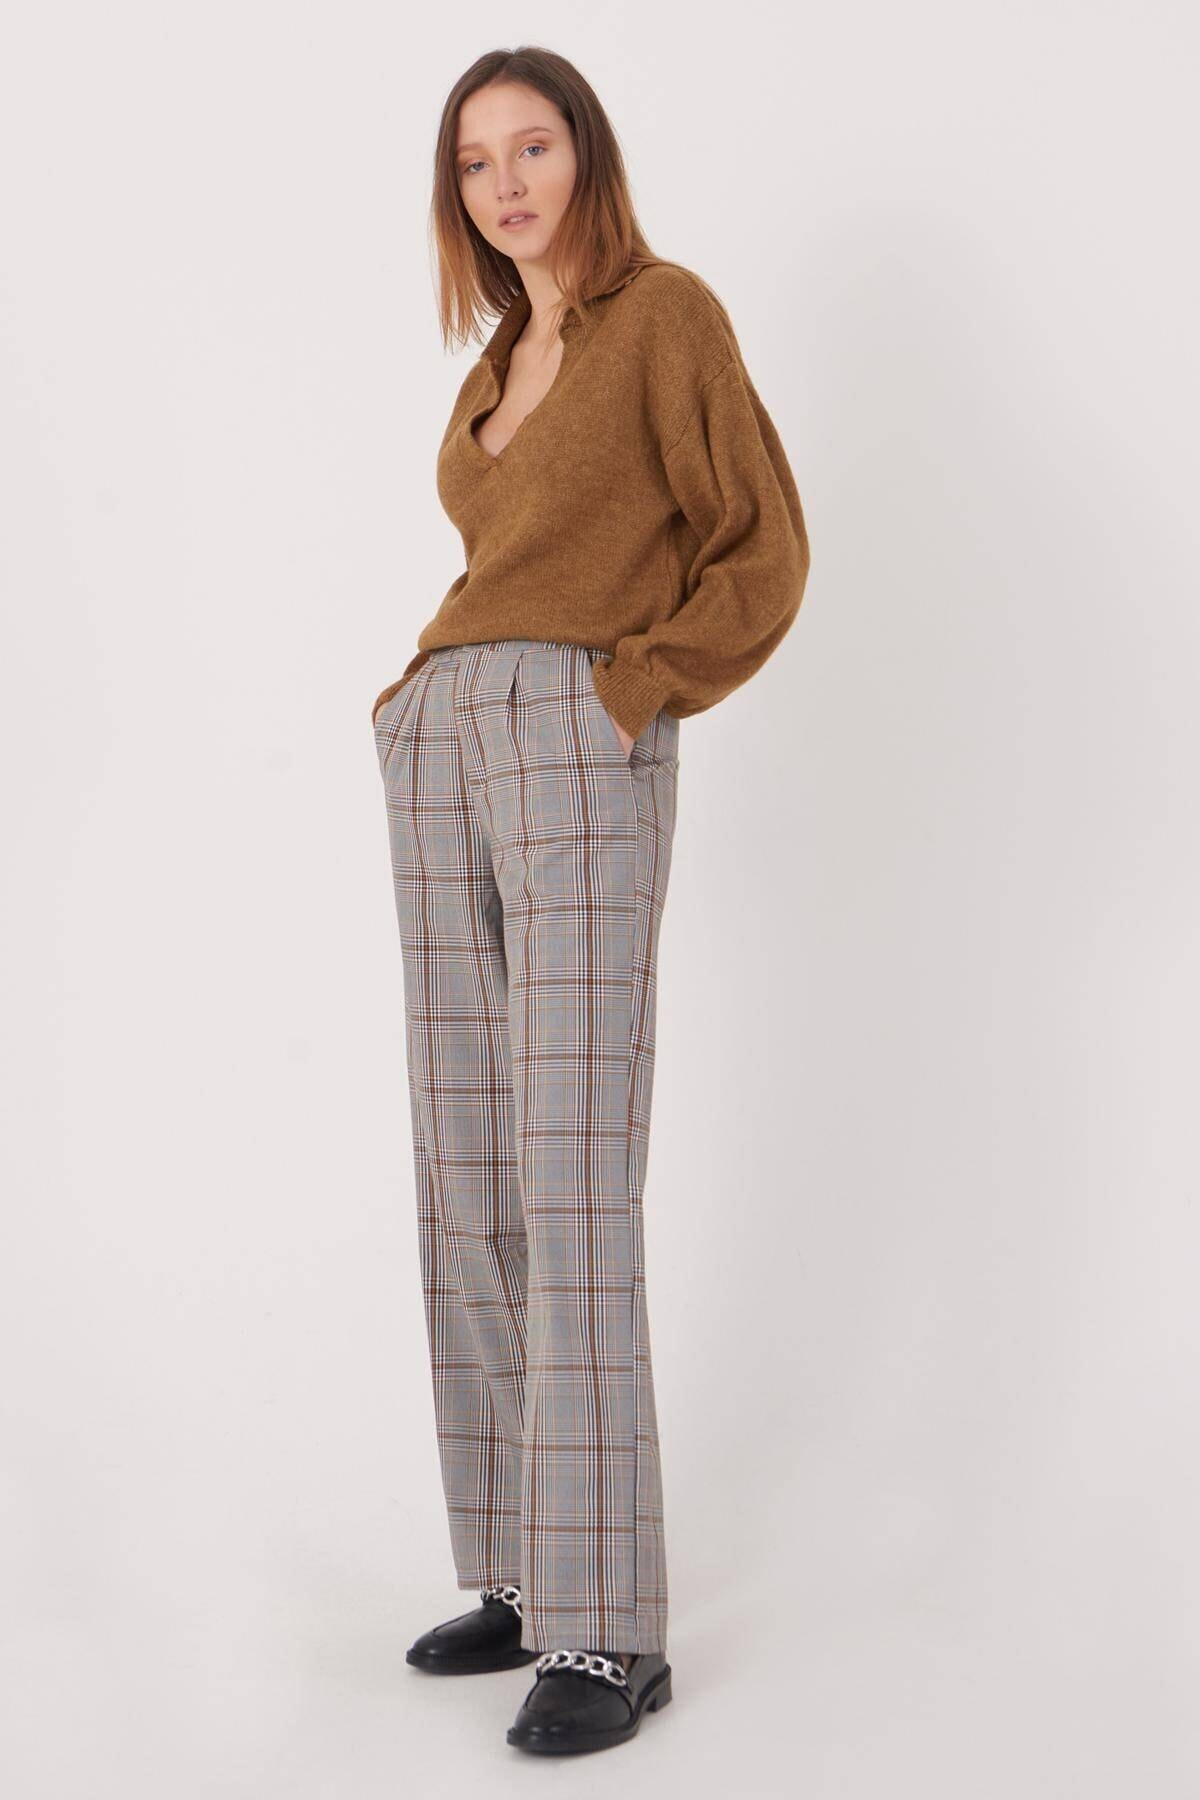 Addax Kadın Gri Ekose Pantolon Pn8098 - T1 Adx-0000023563